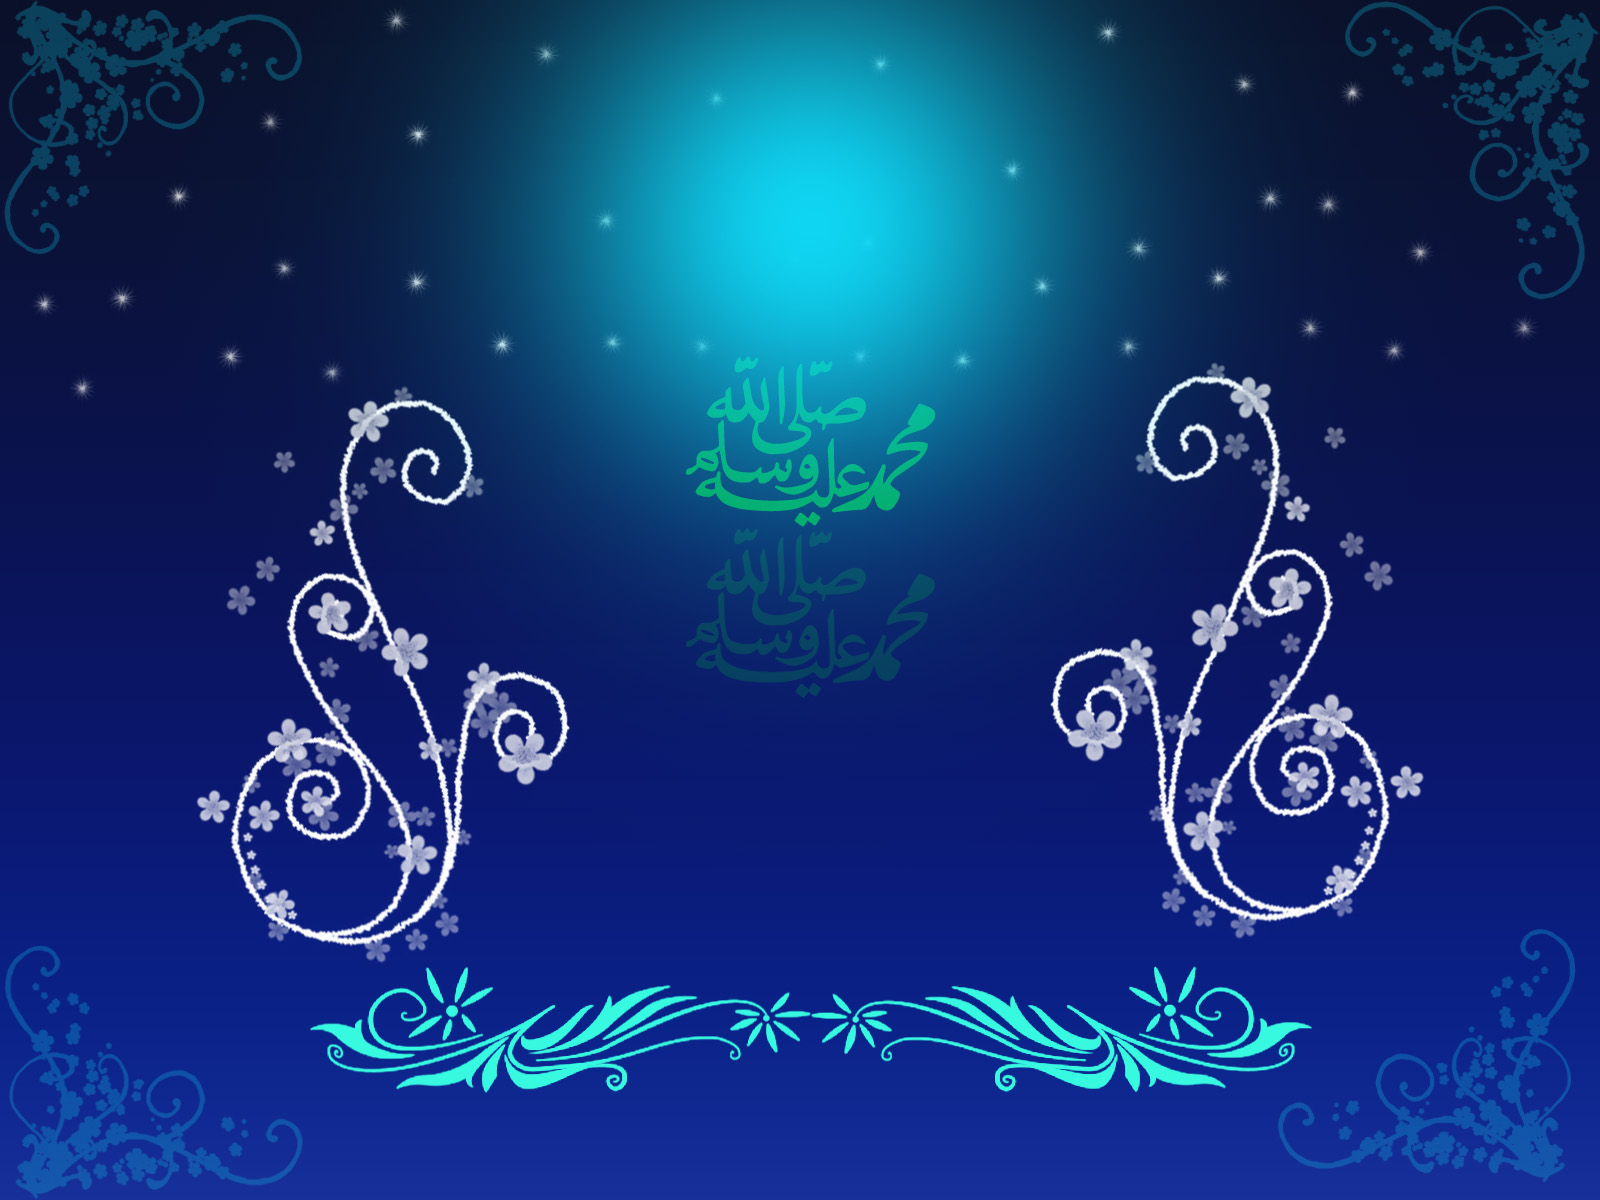 http://1.bp.blogspot.com/-ktagLXX7fUA/T2Bg4lwvffI/AAAAAAAAAnY/4UJFREoECv0/s1600/Wallpaper+Muhammad+Rasulullah+%252815%2529.jpg